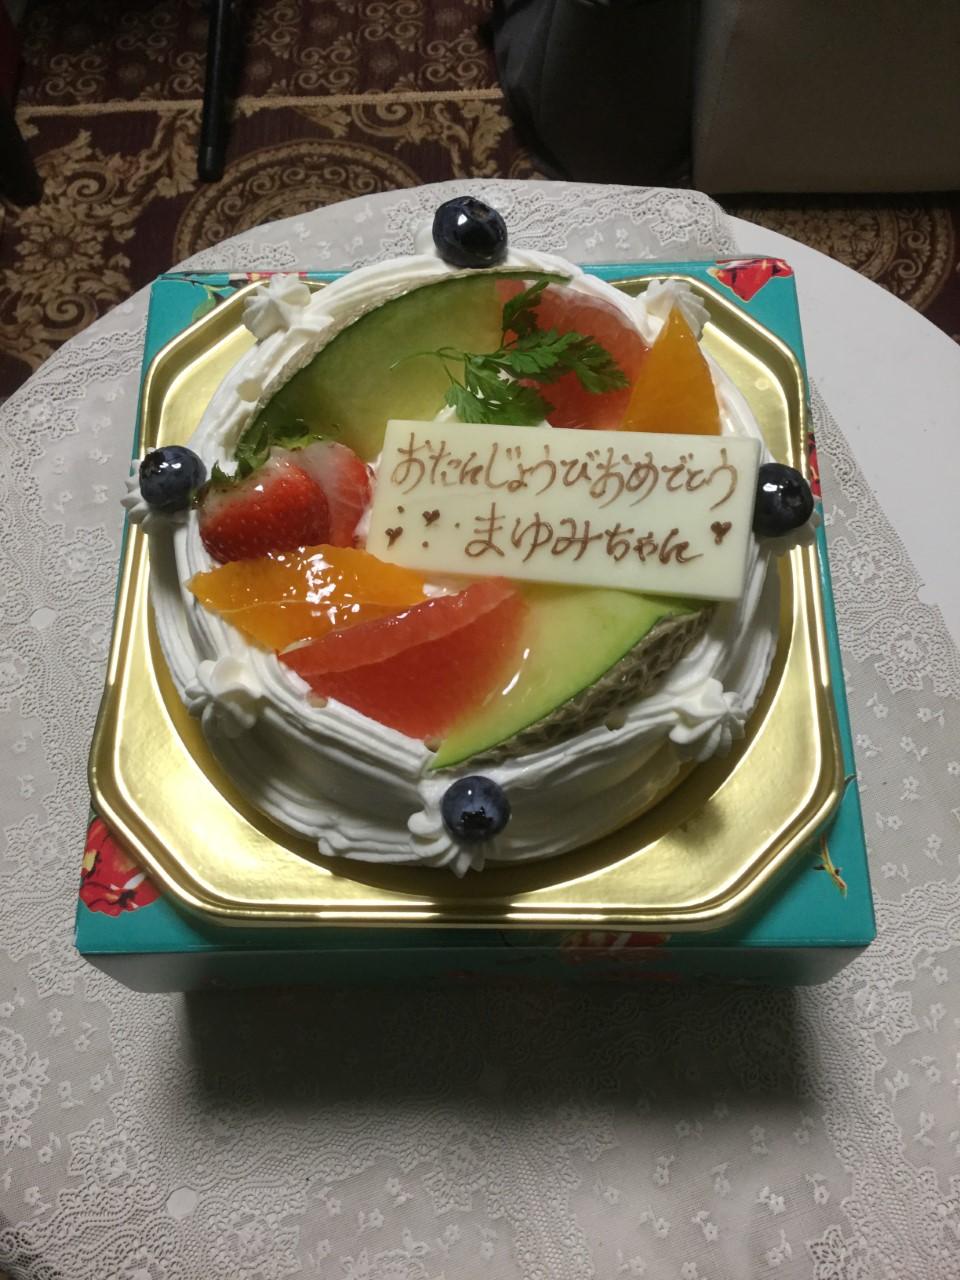 Happy Birthday Dear Mayumi-Chang_e0342933_092746.jpg